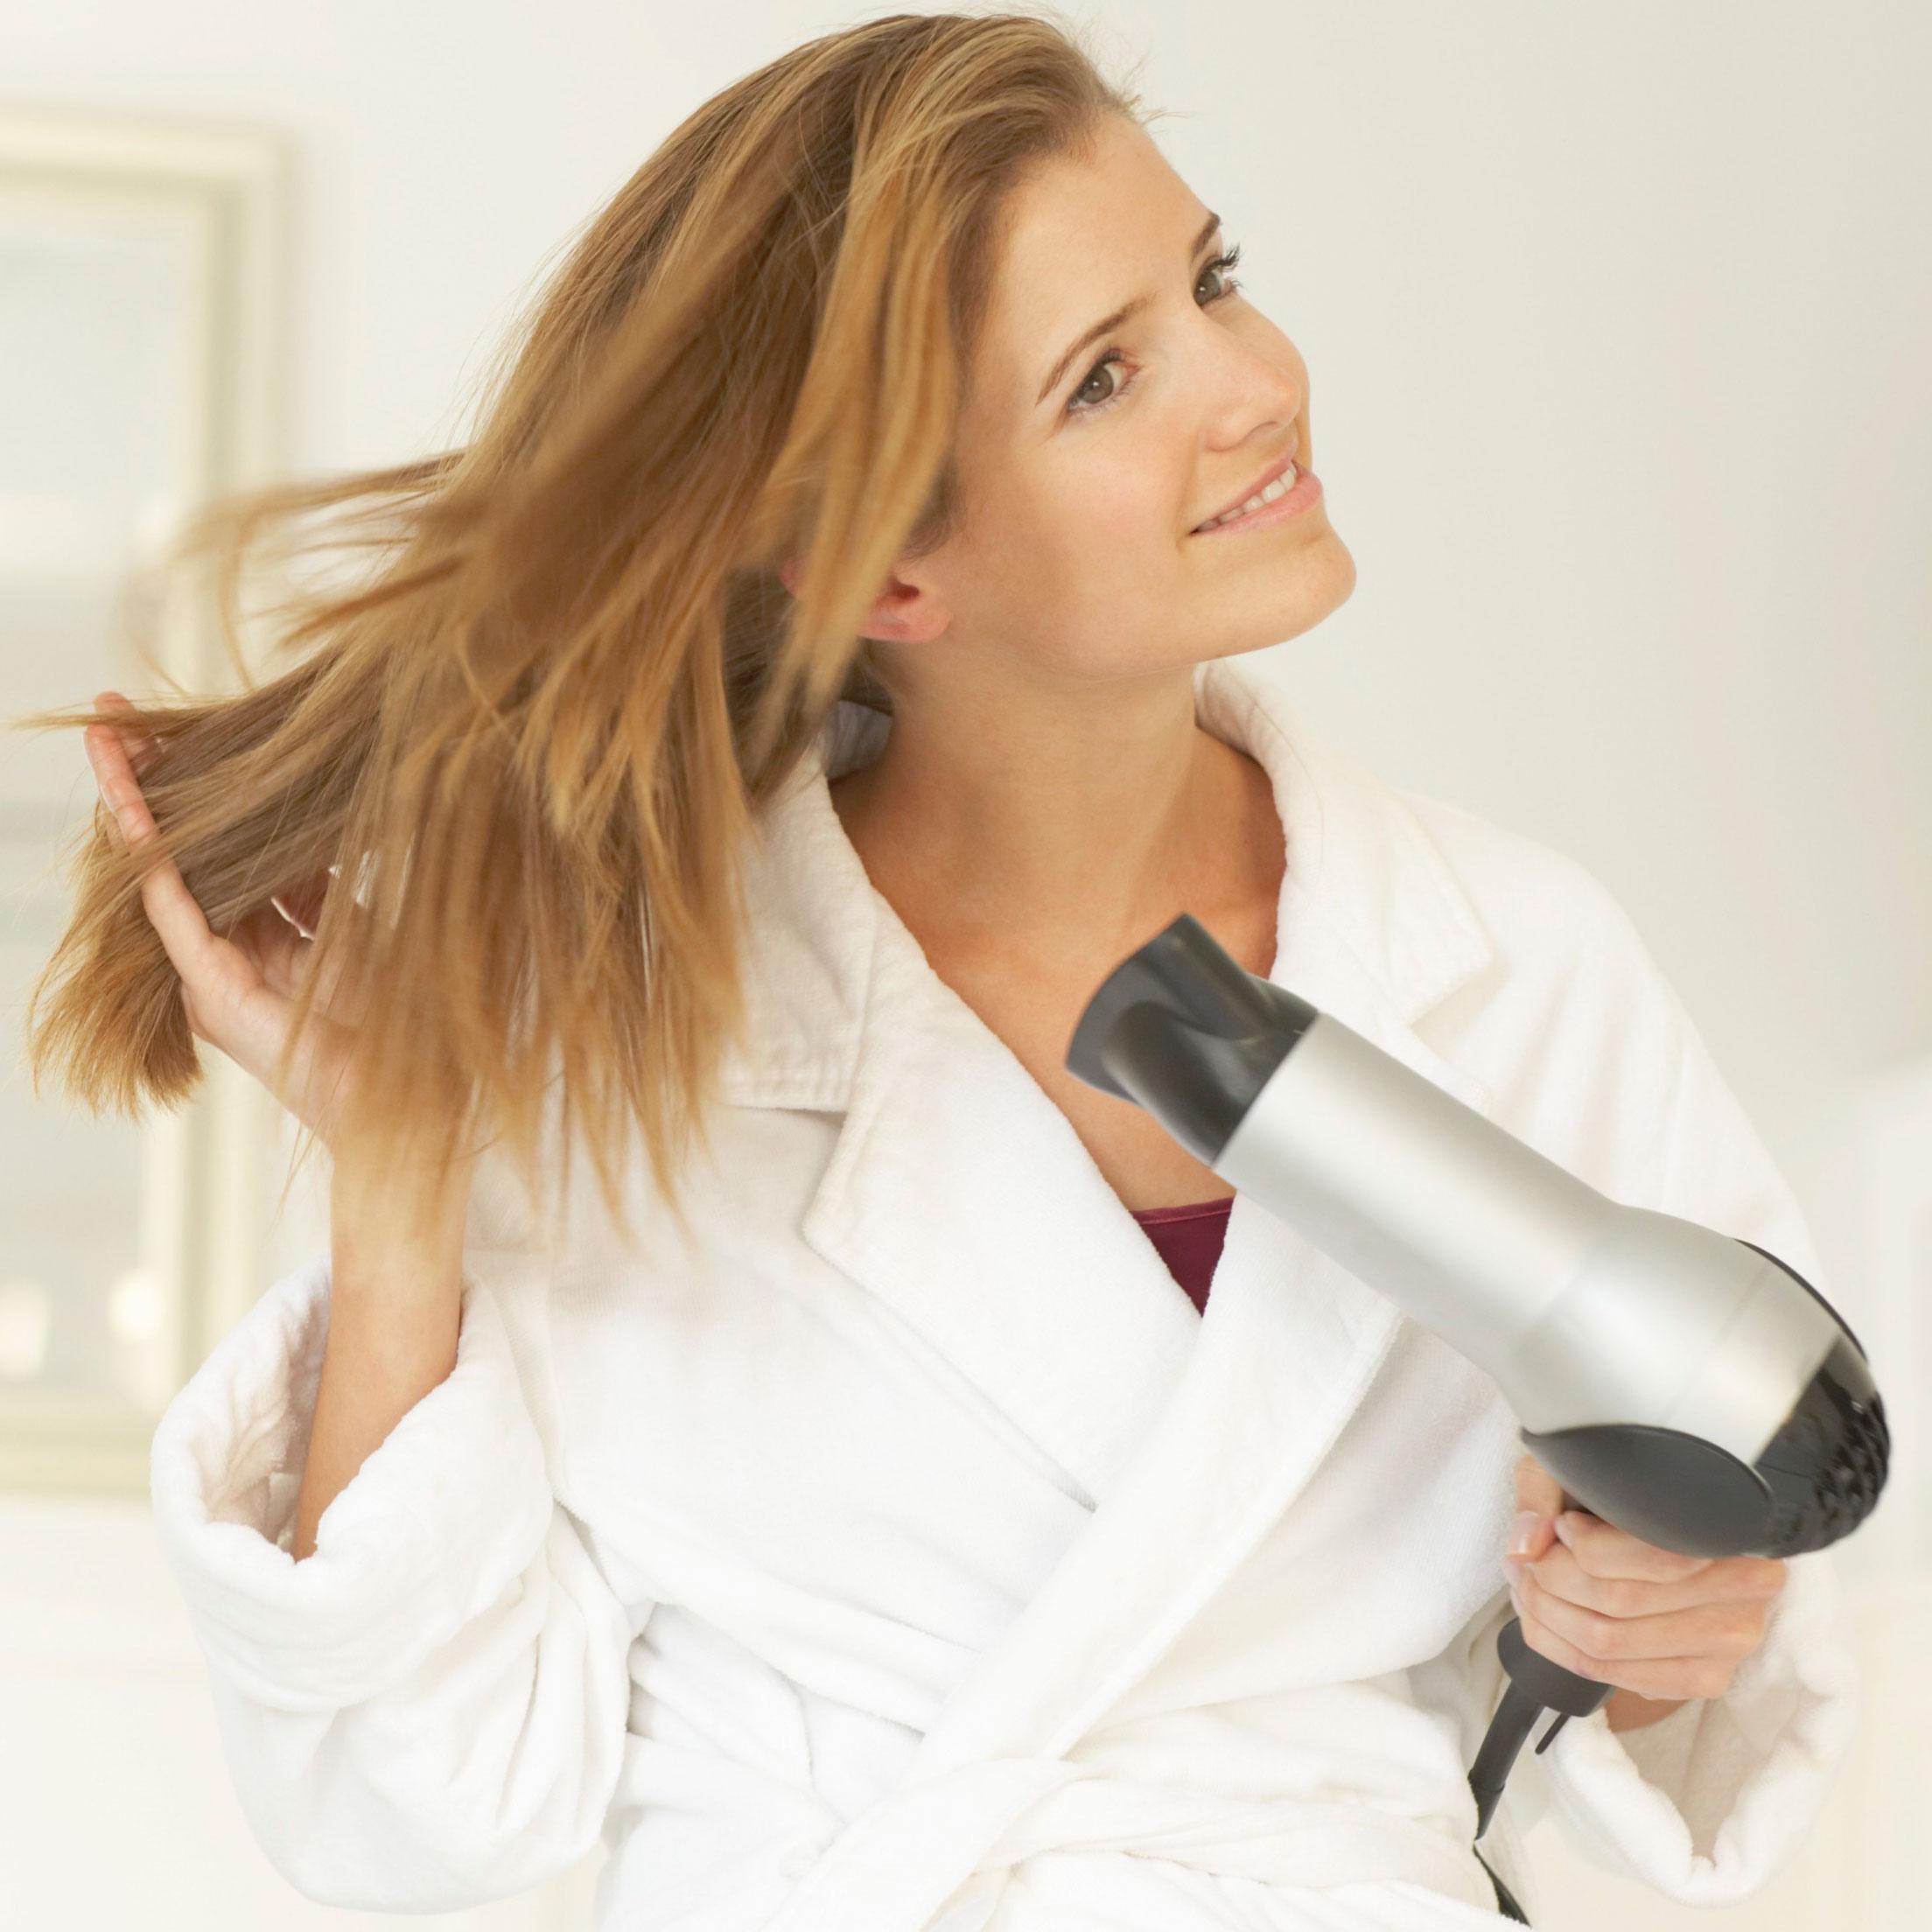 woman-blowdrying-hair-700